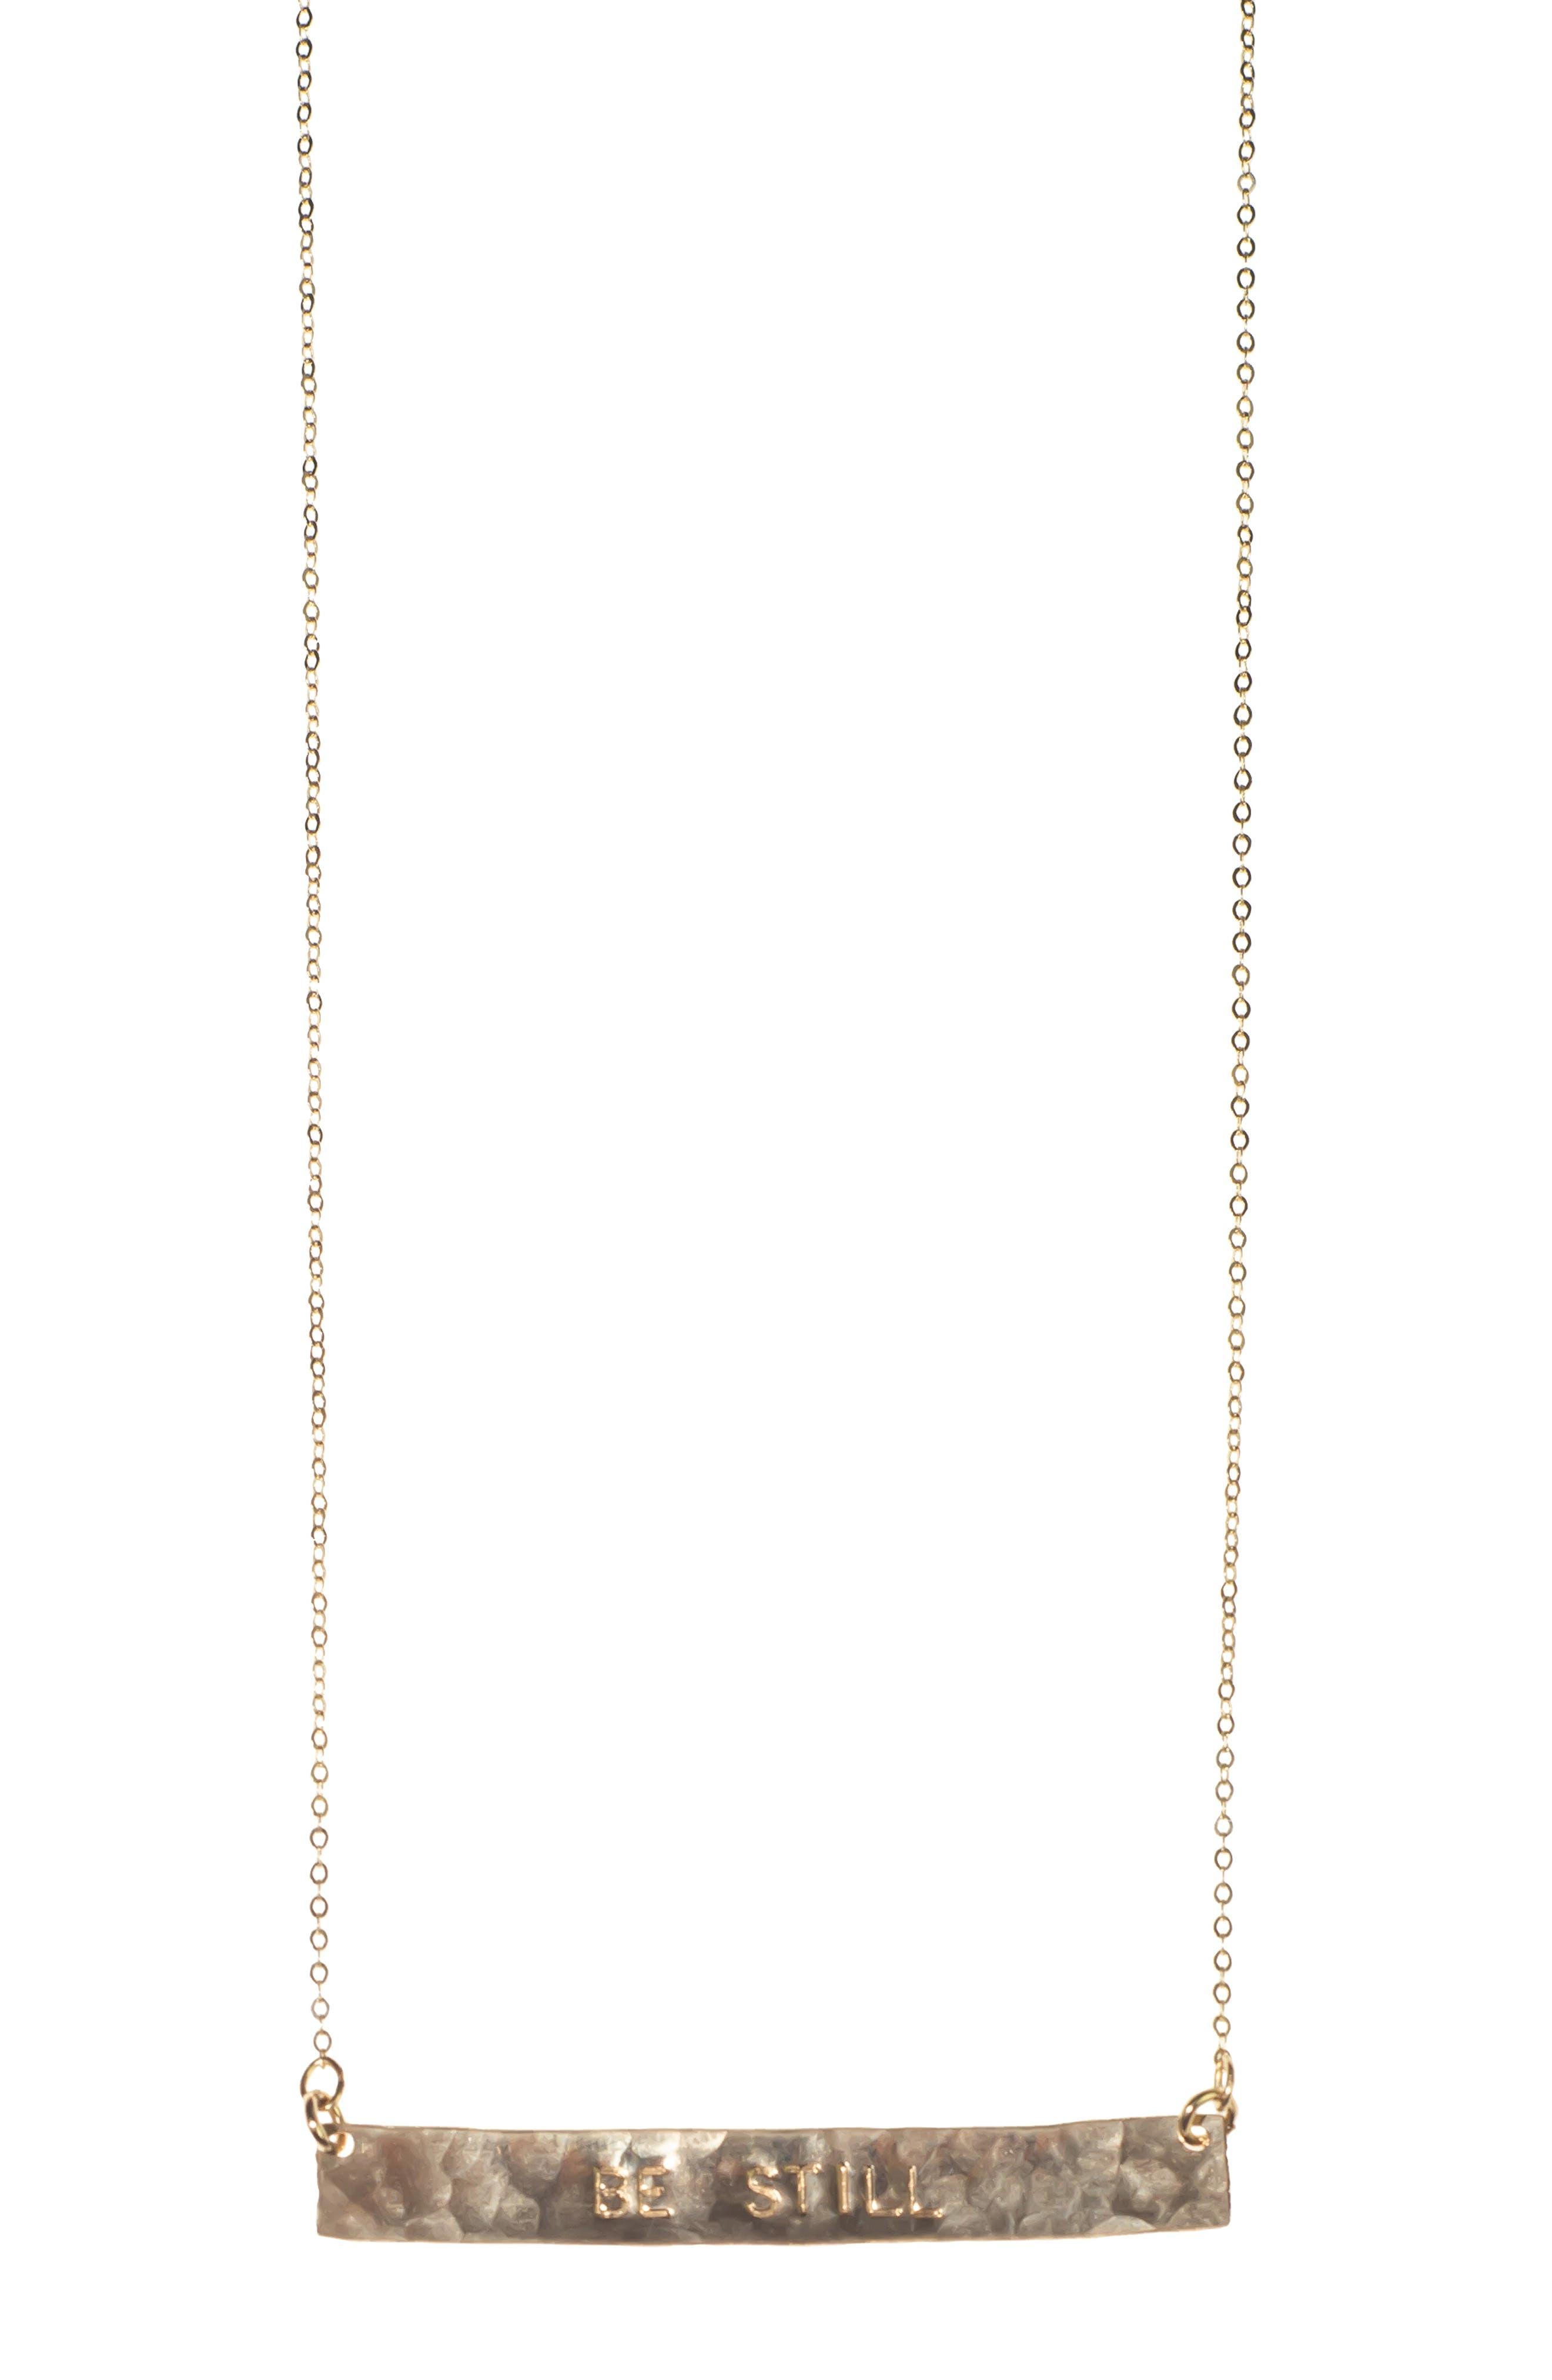 NASHELLE 14K Gold Fill Bar Pendant Necklace, Main, color, GOLD- BE STILL